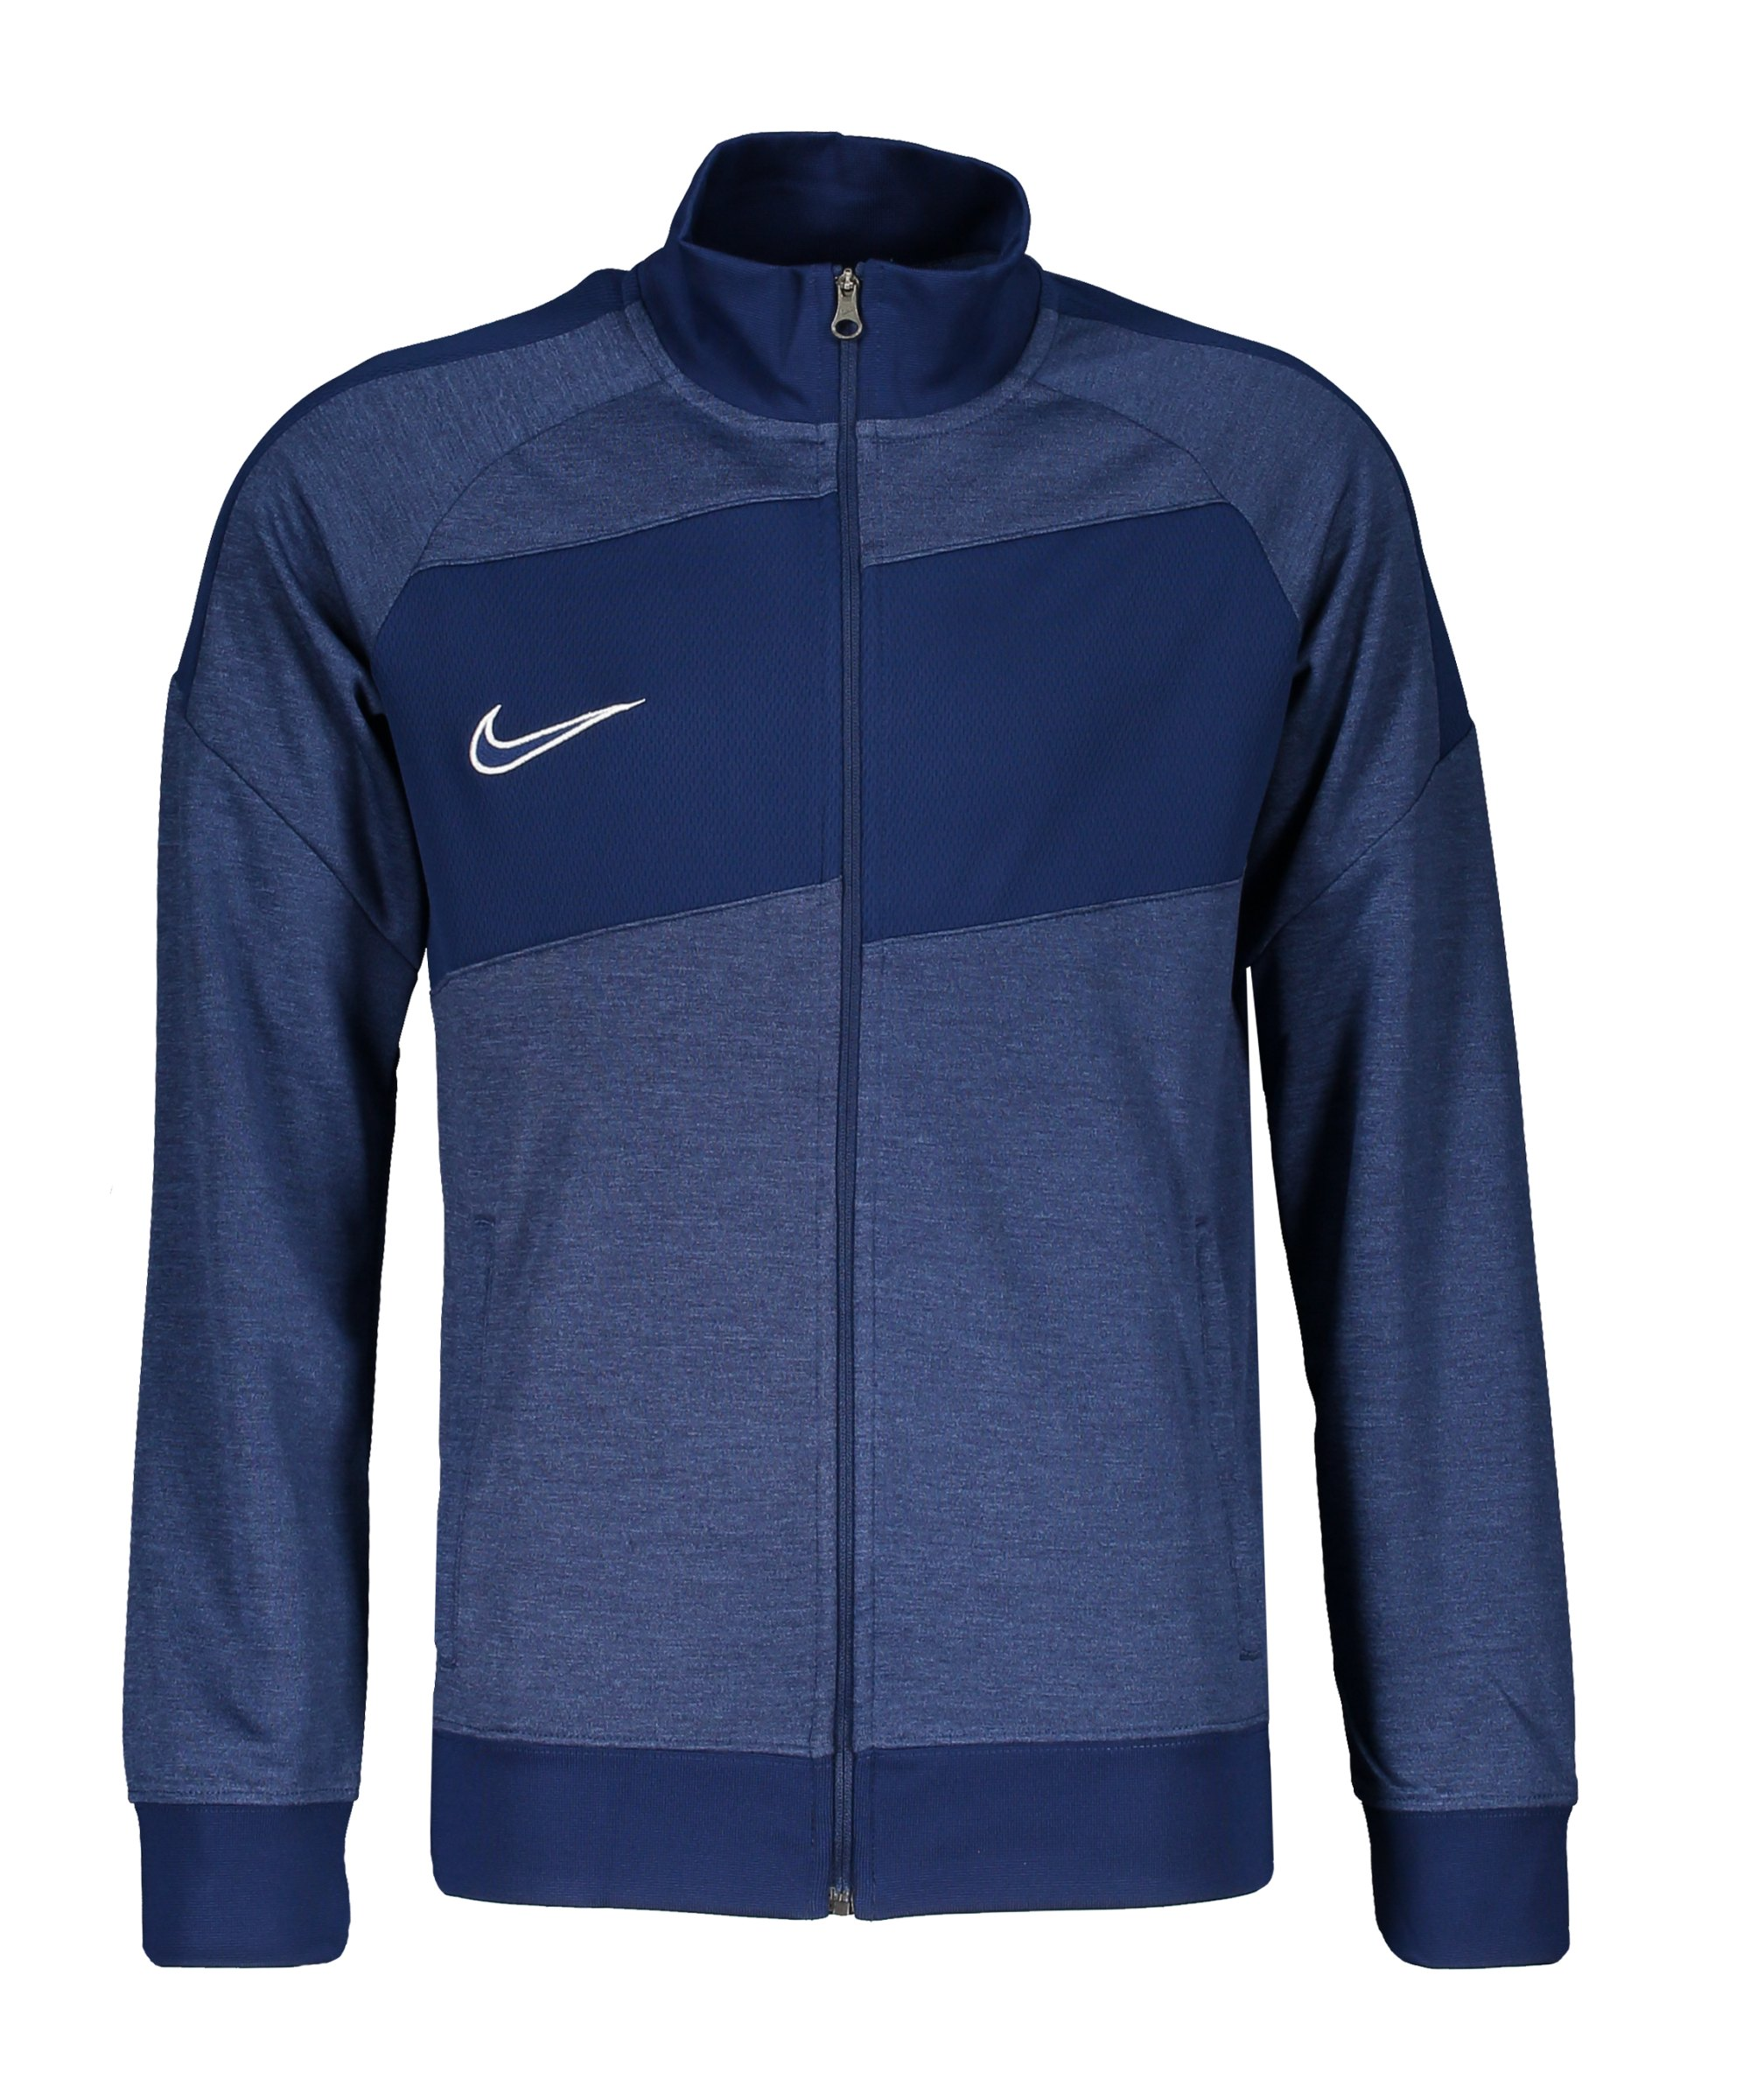 Nike Dry Academy I96 Trainingsjacke Kids Blau F492 - blau